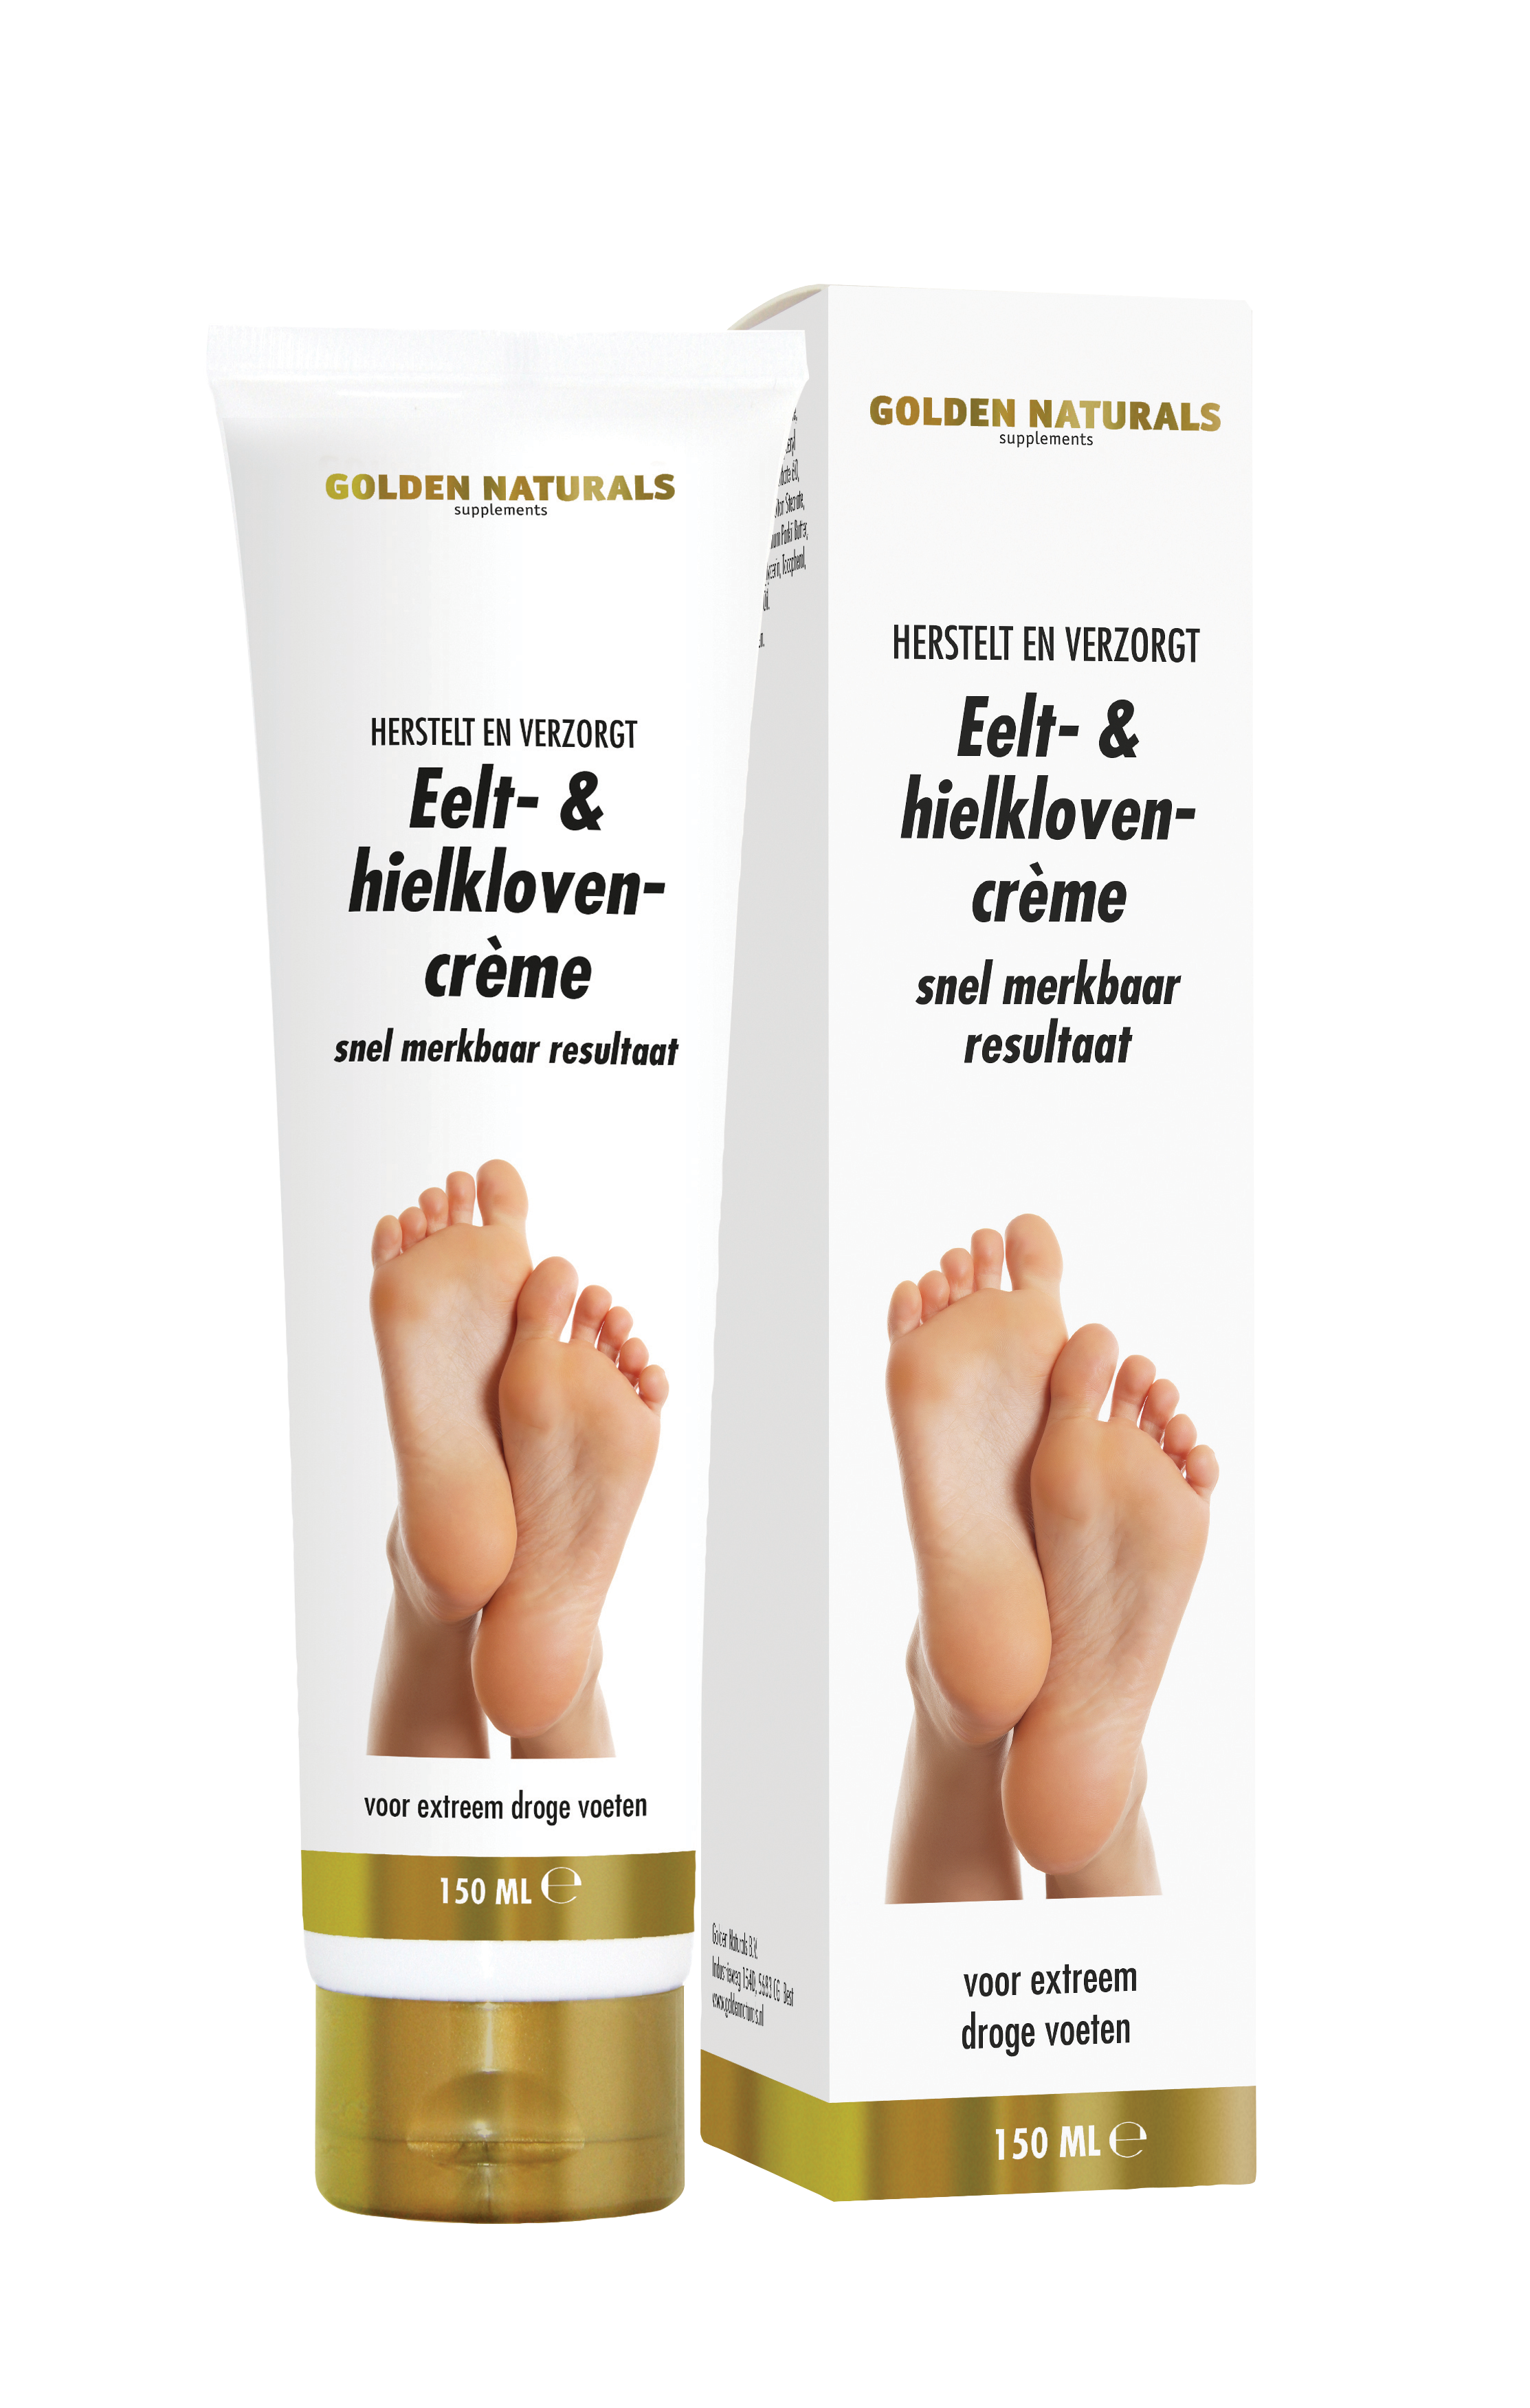 Golden Naturals Eelt- & hielklovencrème (150 milliliter)